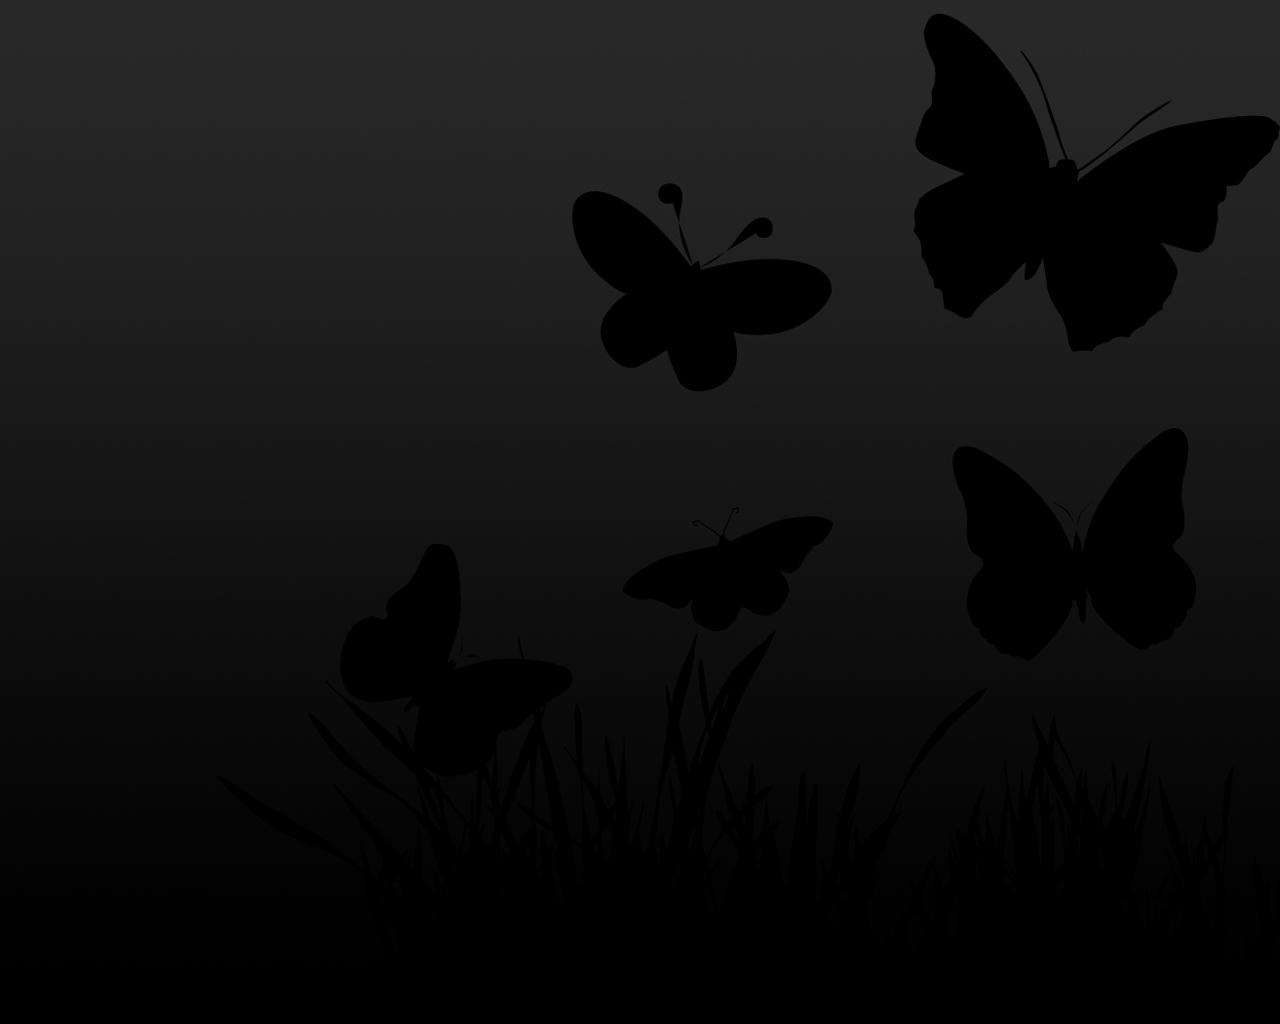 Black Butterfly Wallpaper - Butterflies Wallpaper Black And White , HD Wallpaper & Backgrounds